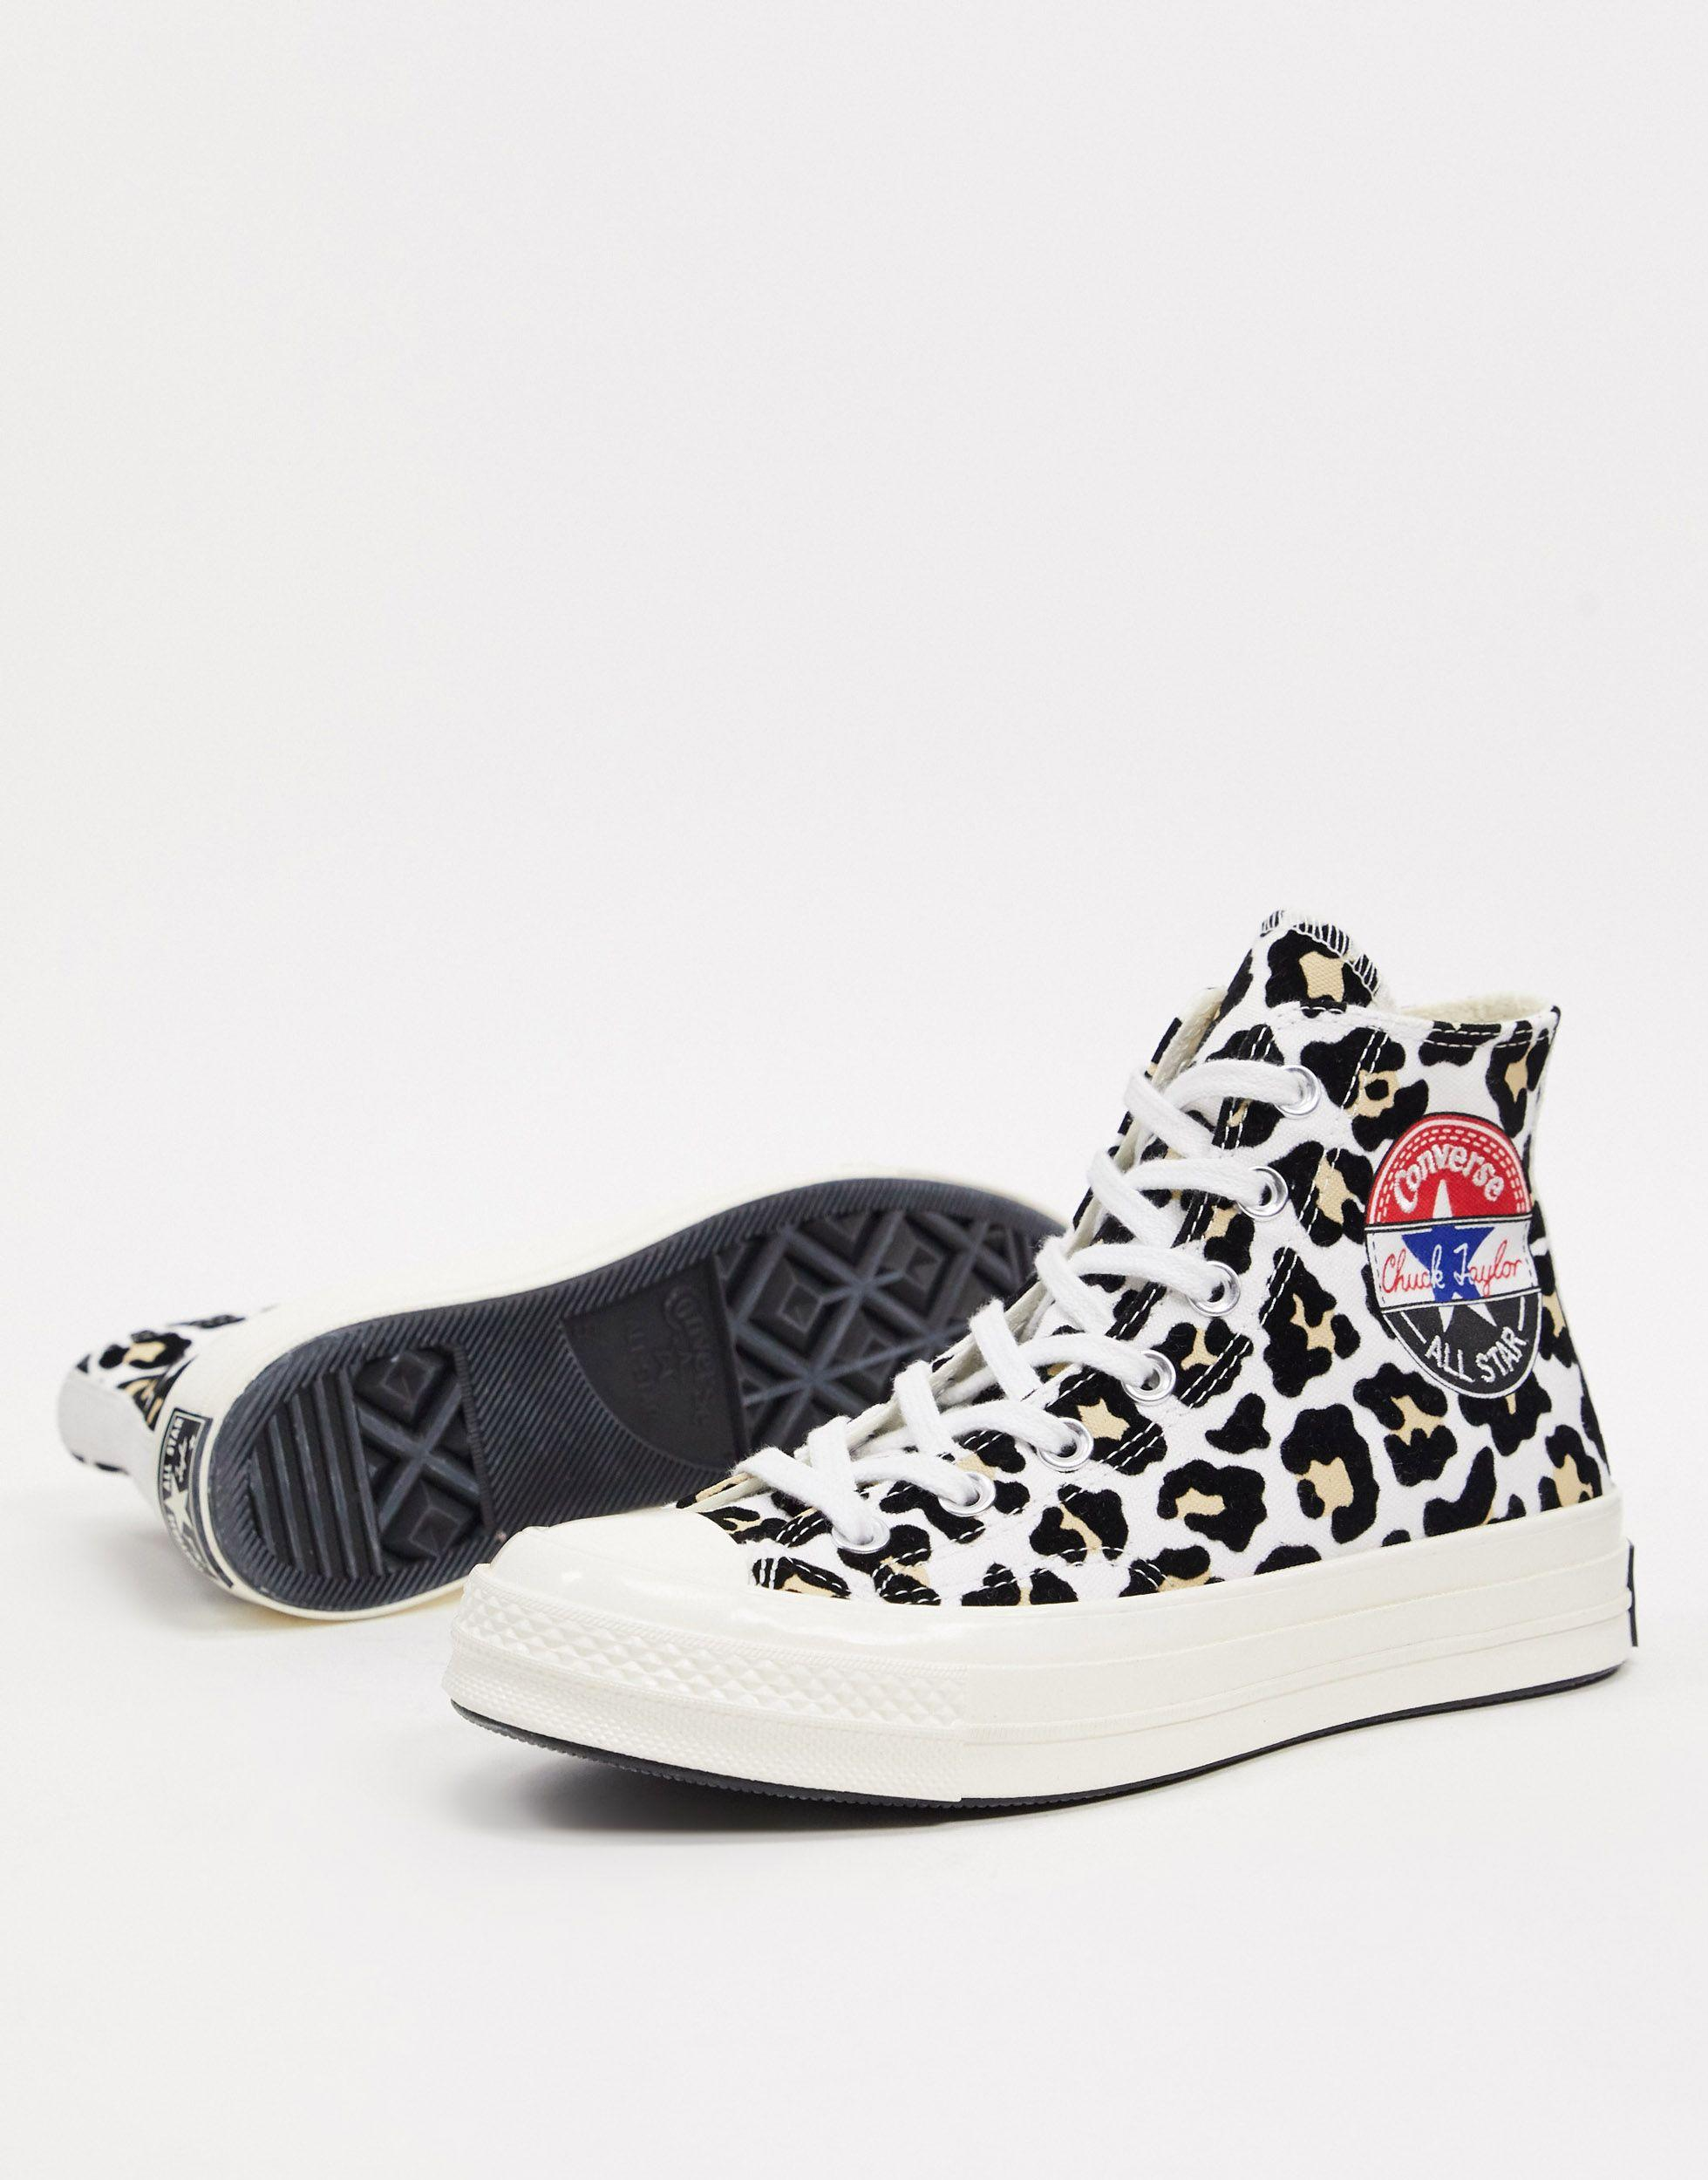 Converse Rubber Chuck '70 Hi Flocked Leopard Print Sneakers-multi ...